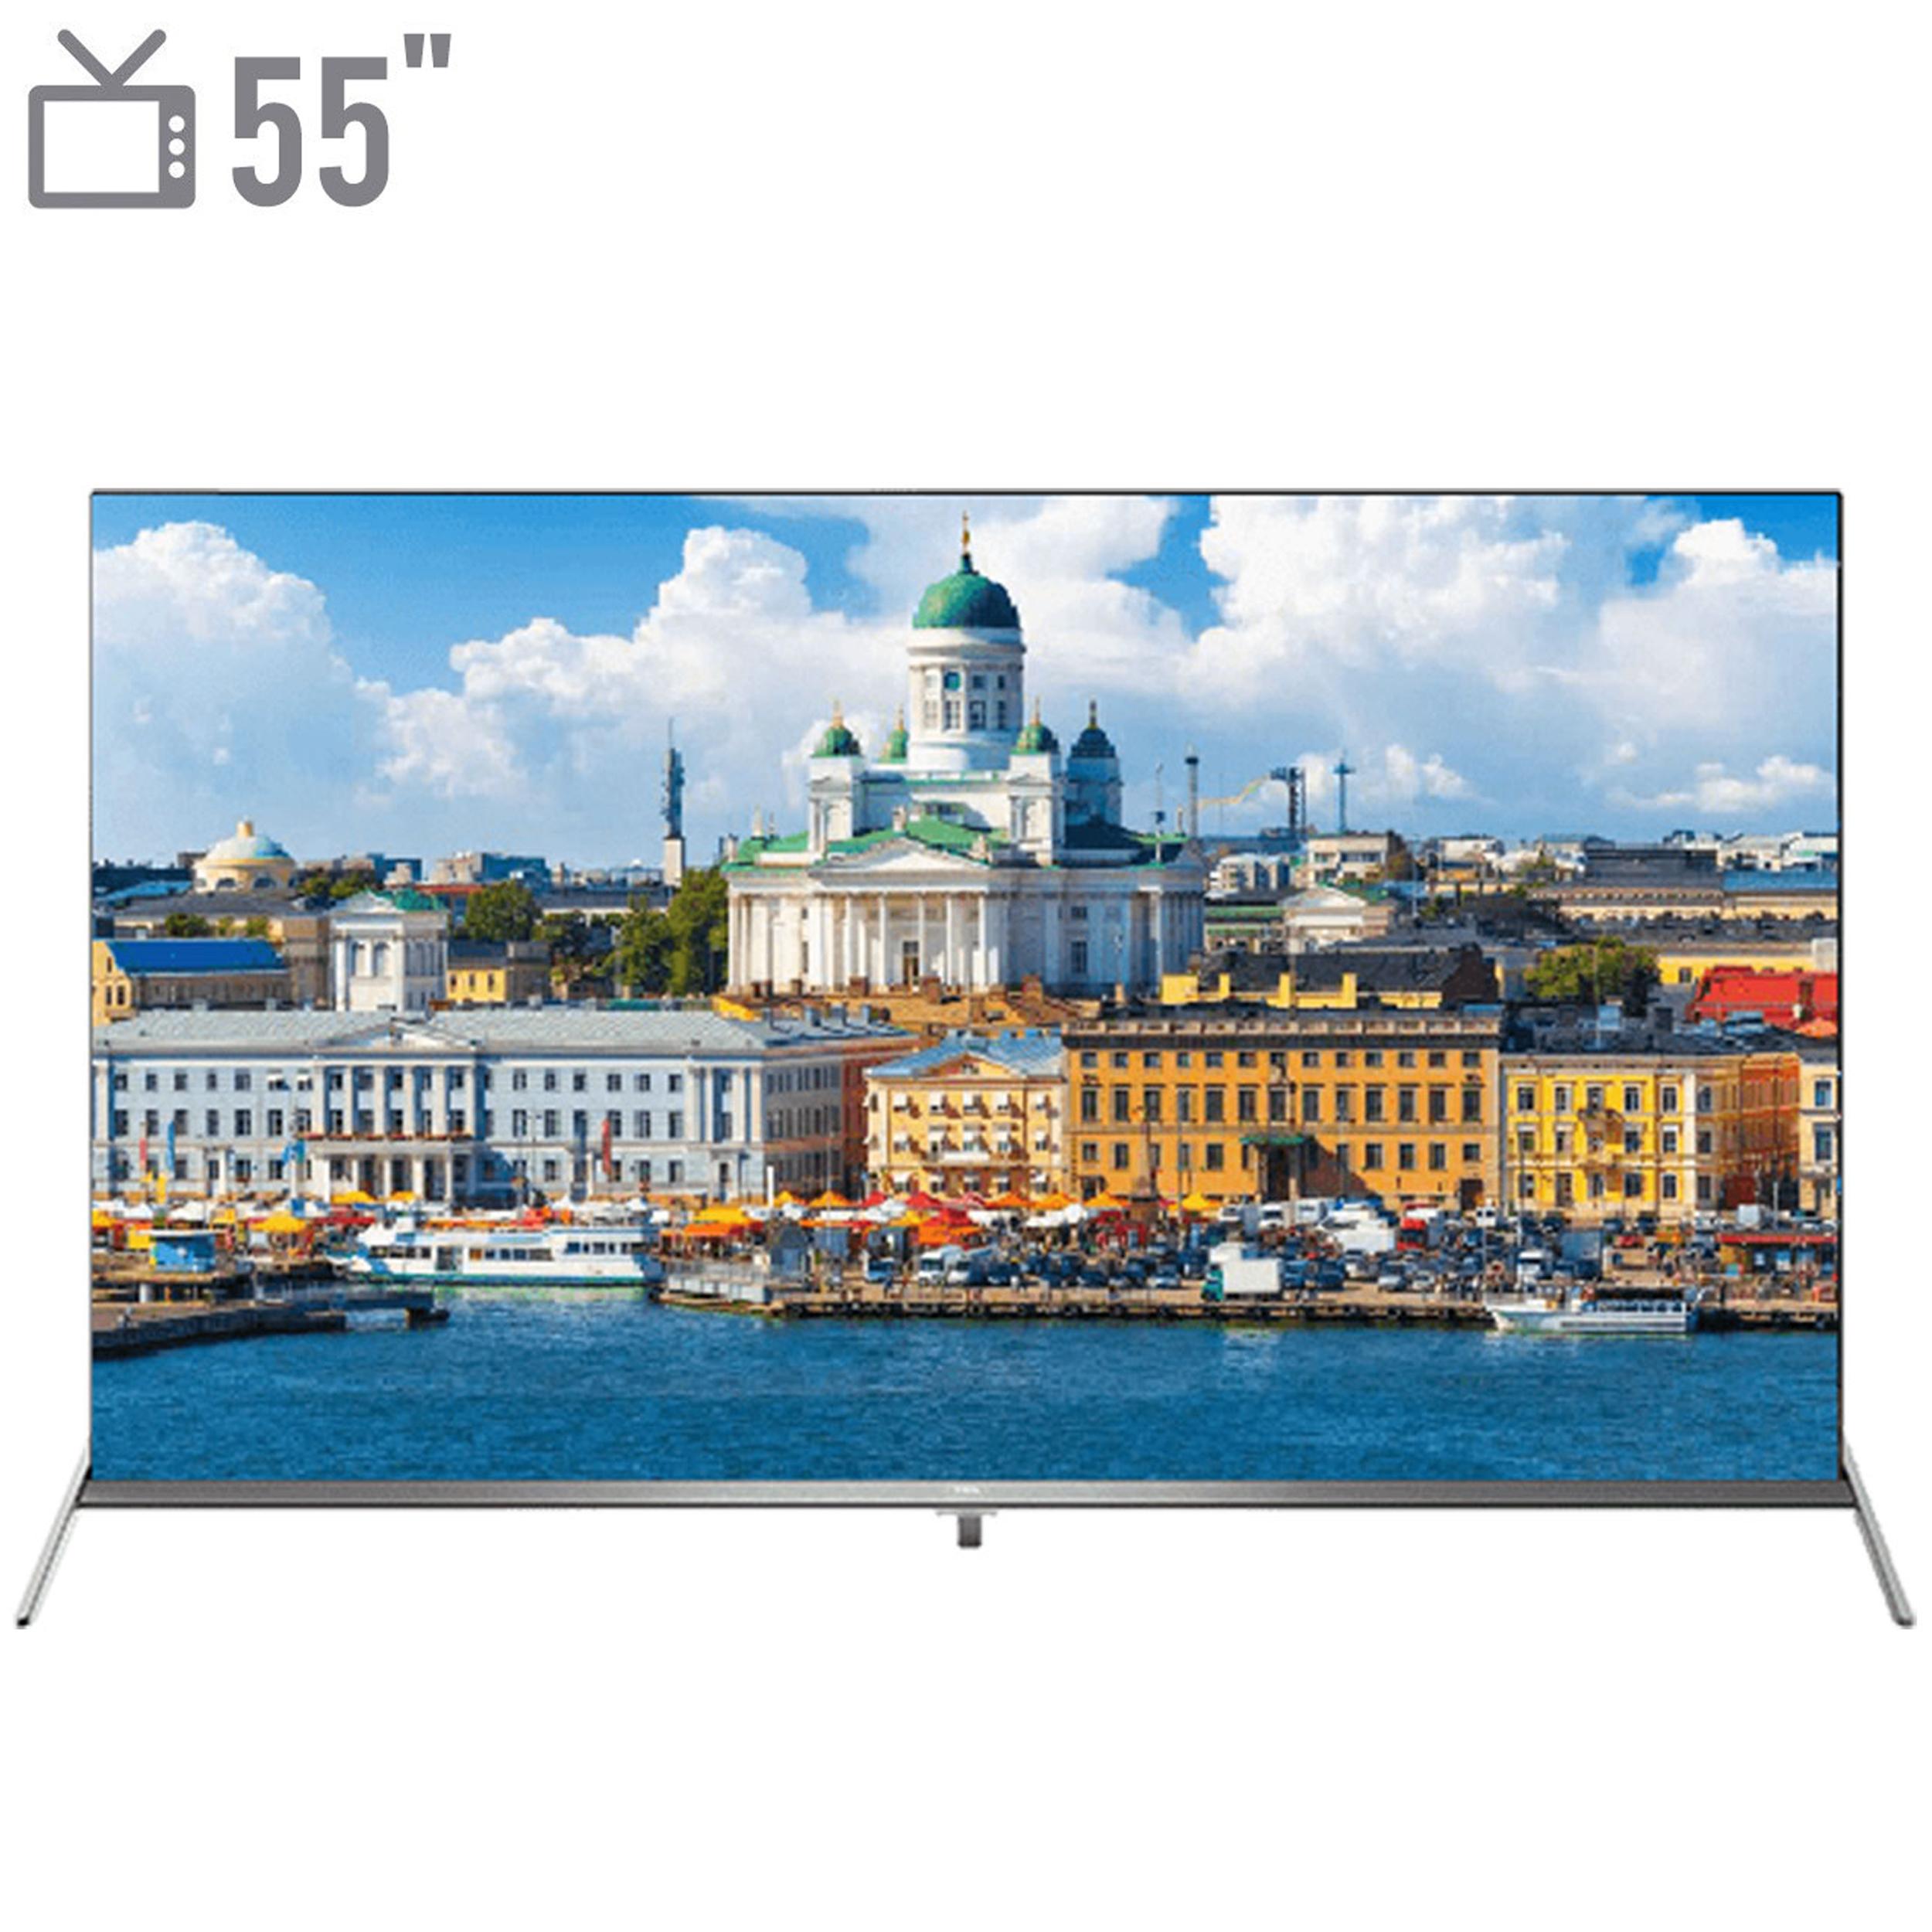 تصویر تلویزیون ال ای دی هوشمند تی سی ال مدل 55P8S سایز 55 اینچ TCL LED 55P8S 55INCH